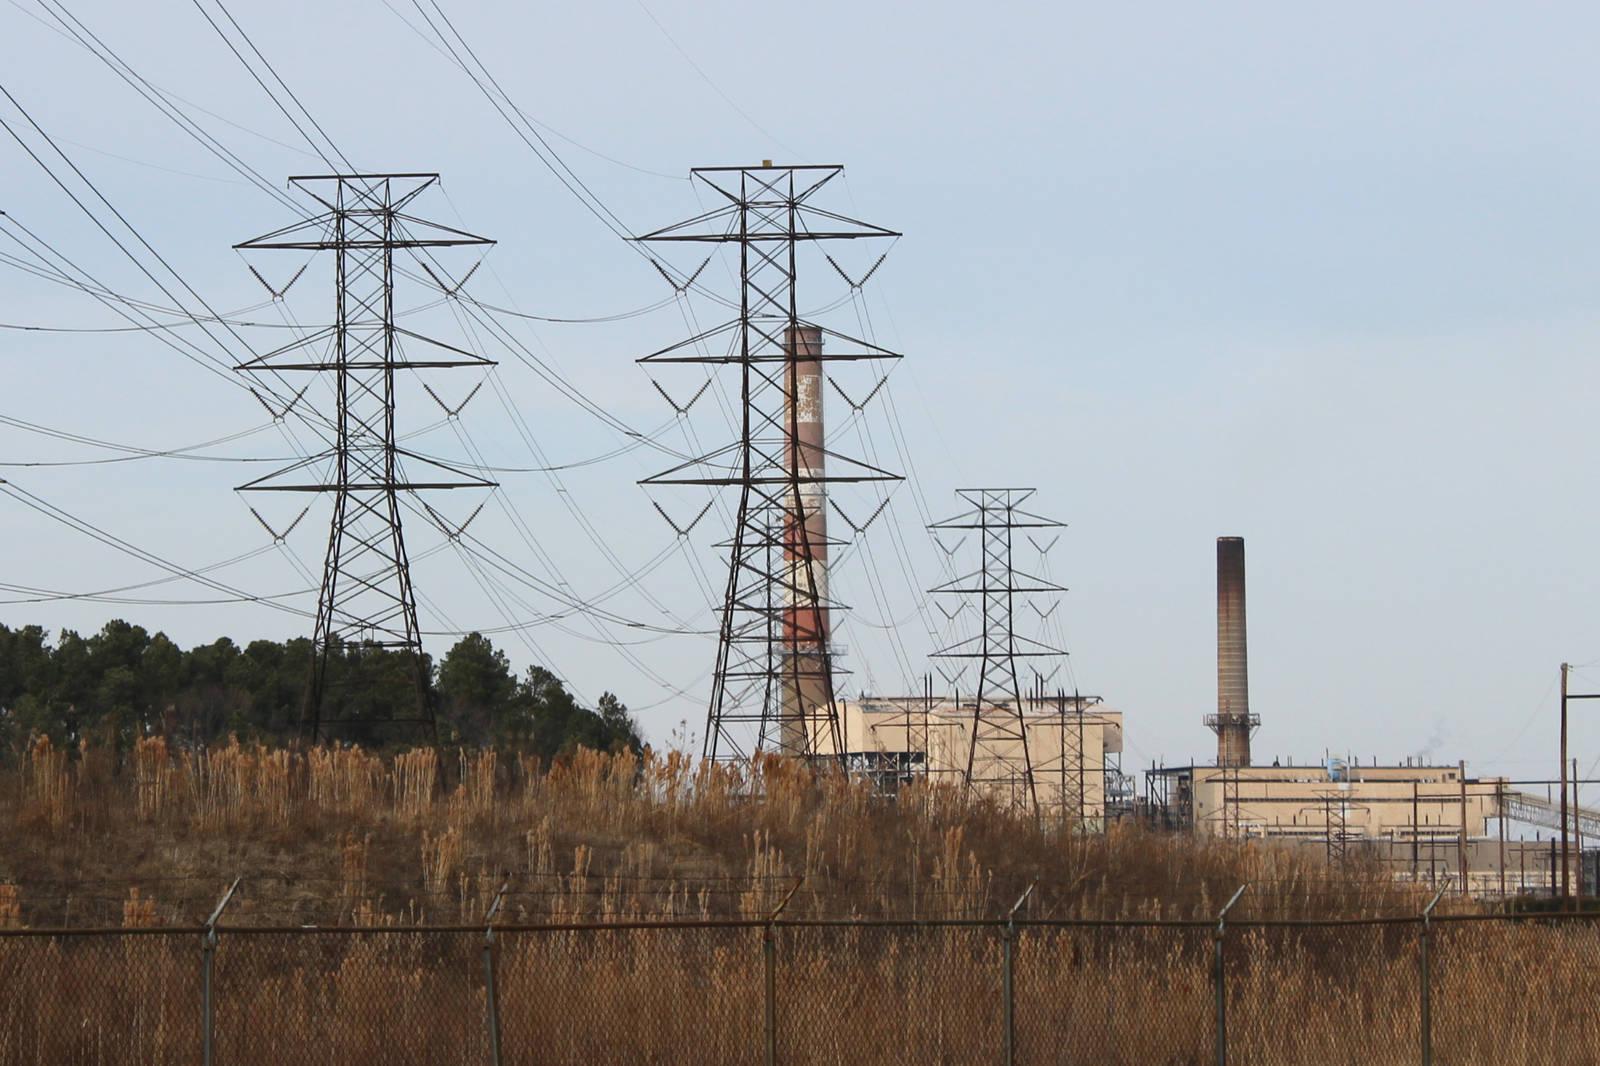 Yorktown Power Station, Virginia. Credit: Carmen Shields/CC-BY-2.0